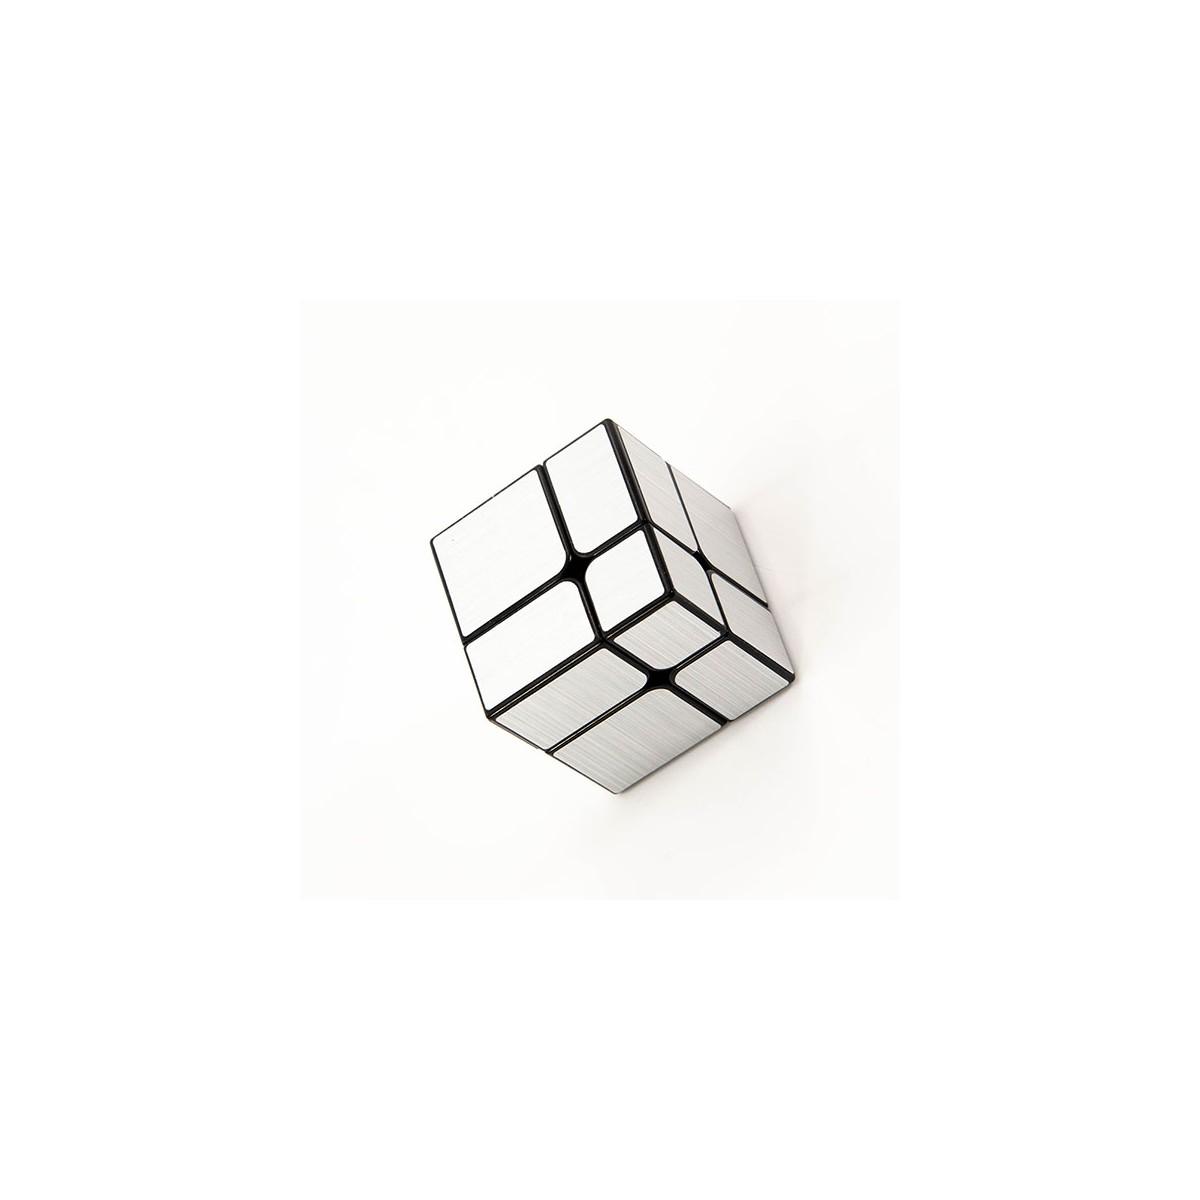 YongJun 2x2 Mirror Cube E Puzzle